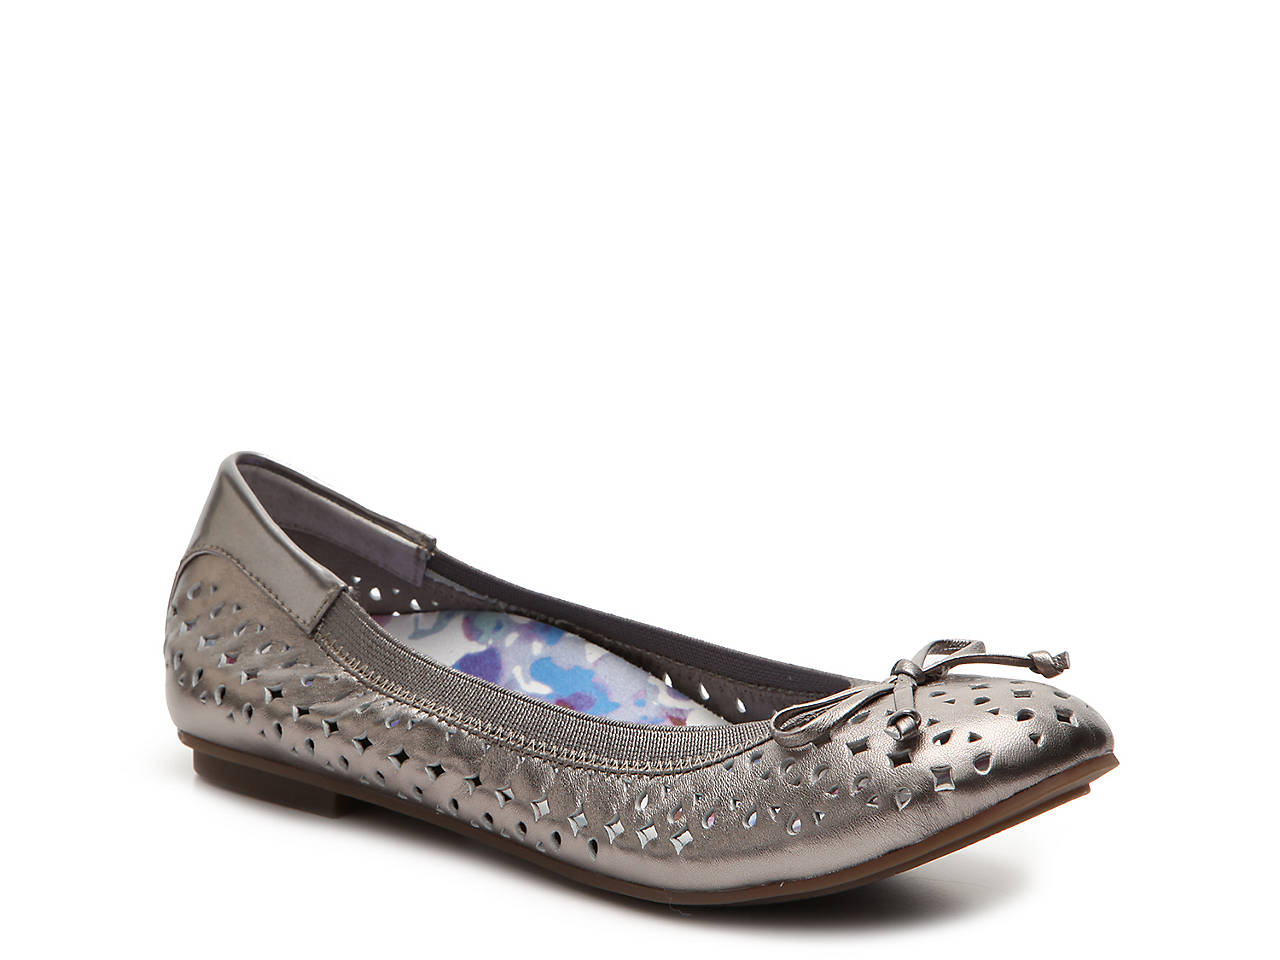 3b9b74cd03e6b Vionic Surin Ballet Flat Women's Shoes | DSW